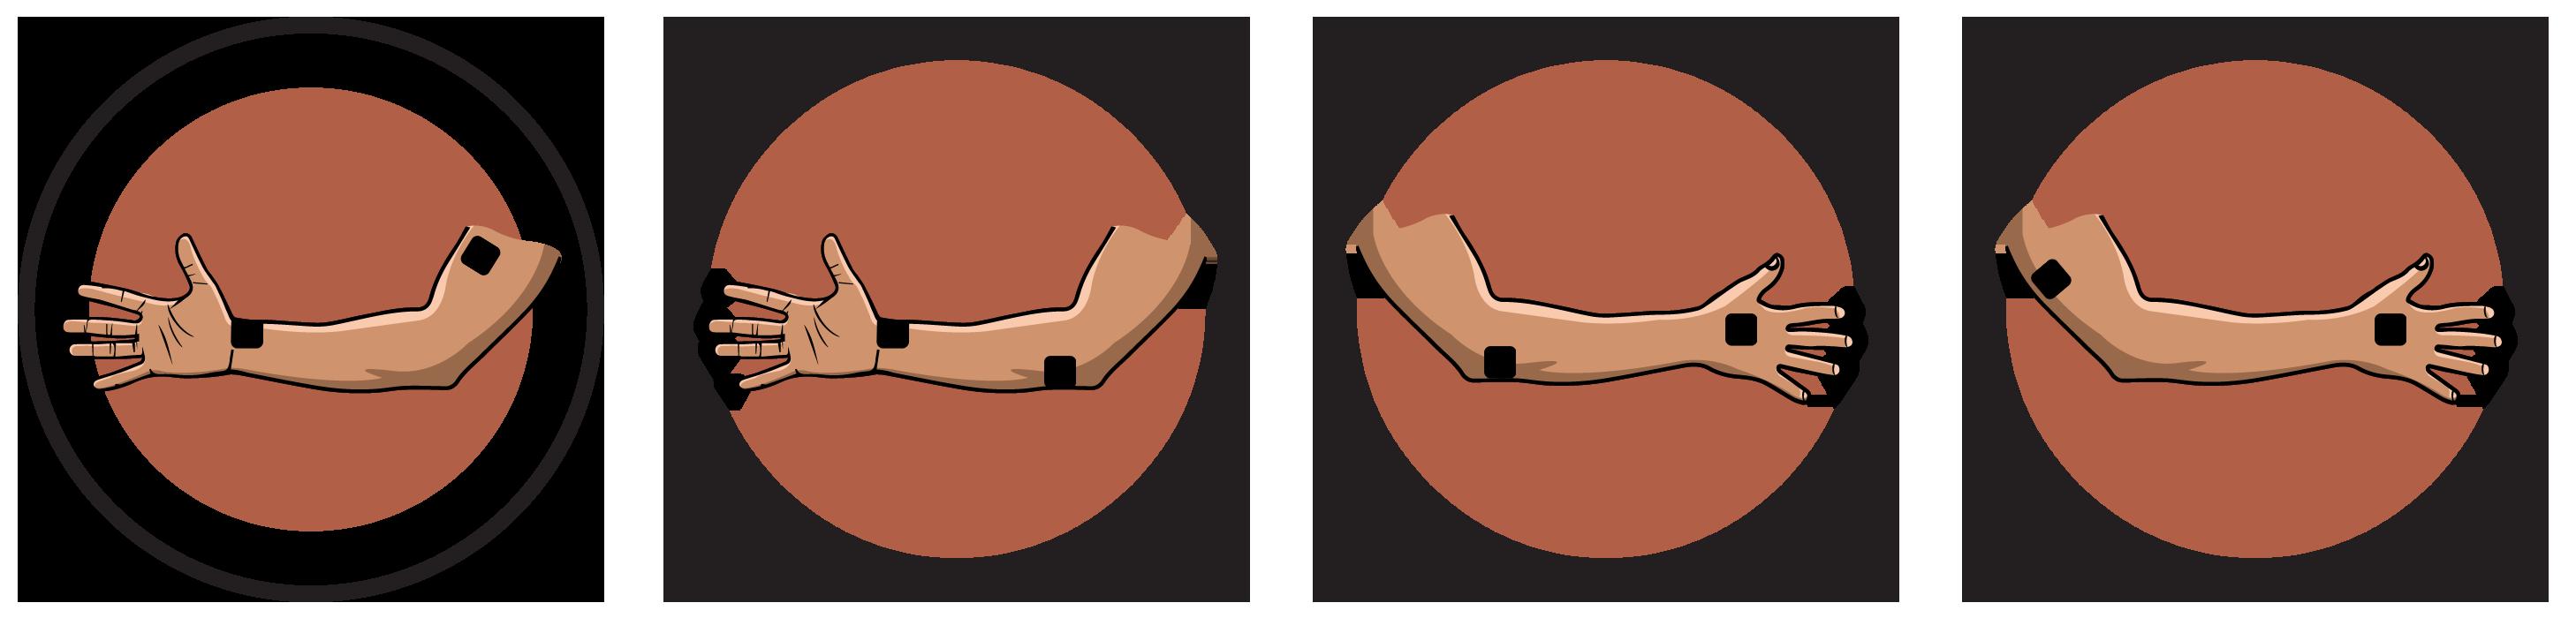 Ulnar Nerve Lesion Electrode Pad Placement